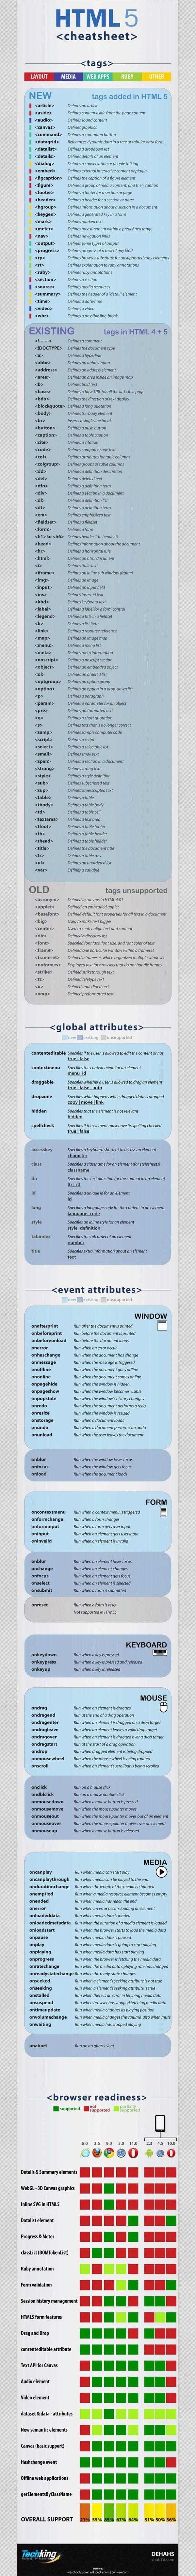 Hypertext Markup Language 5 Cheat sheet   Downgraf - Design Weblog For Designers